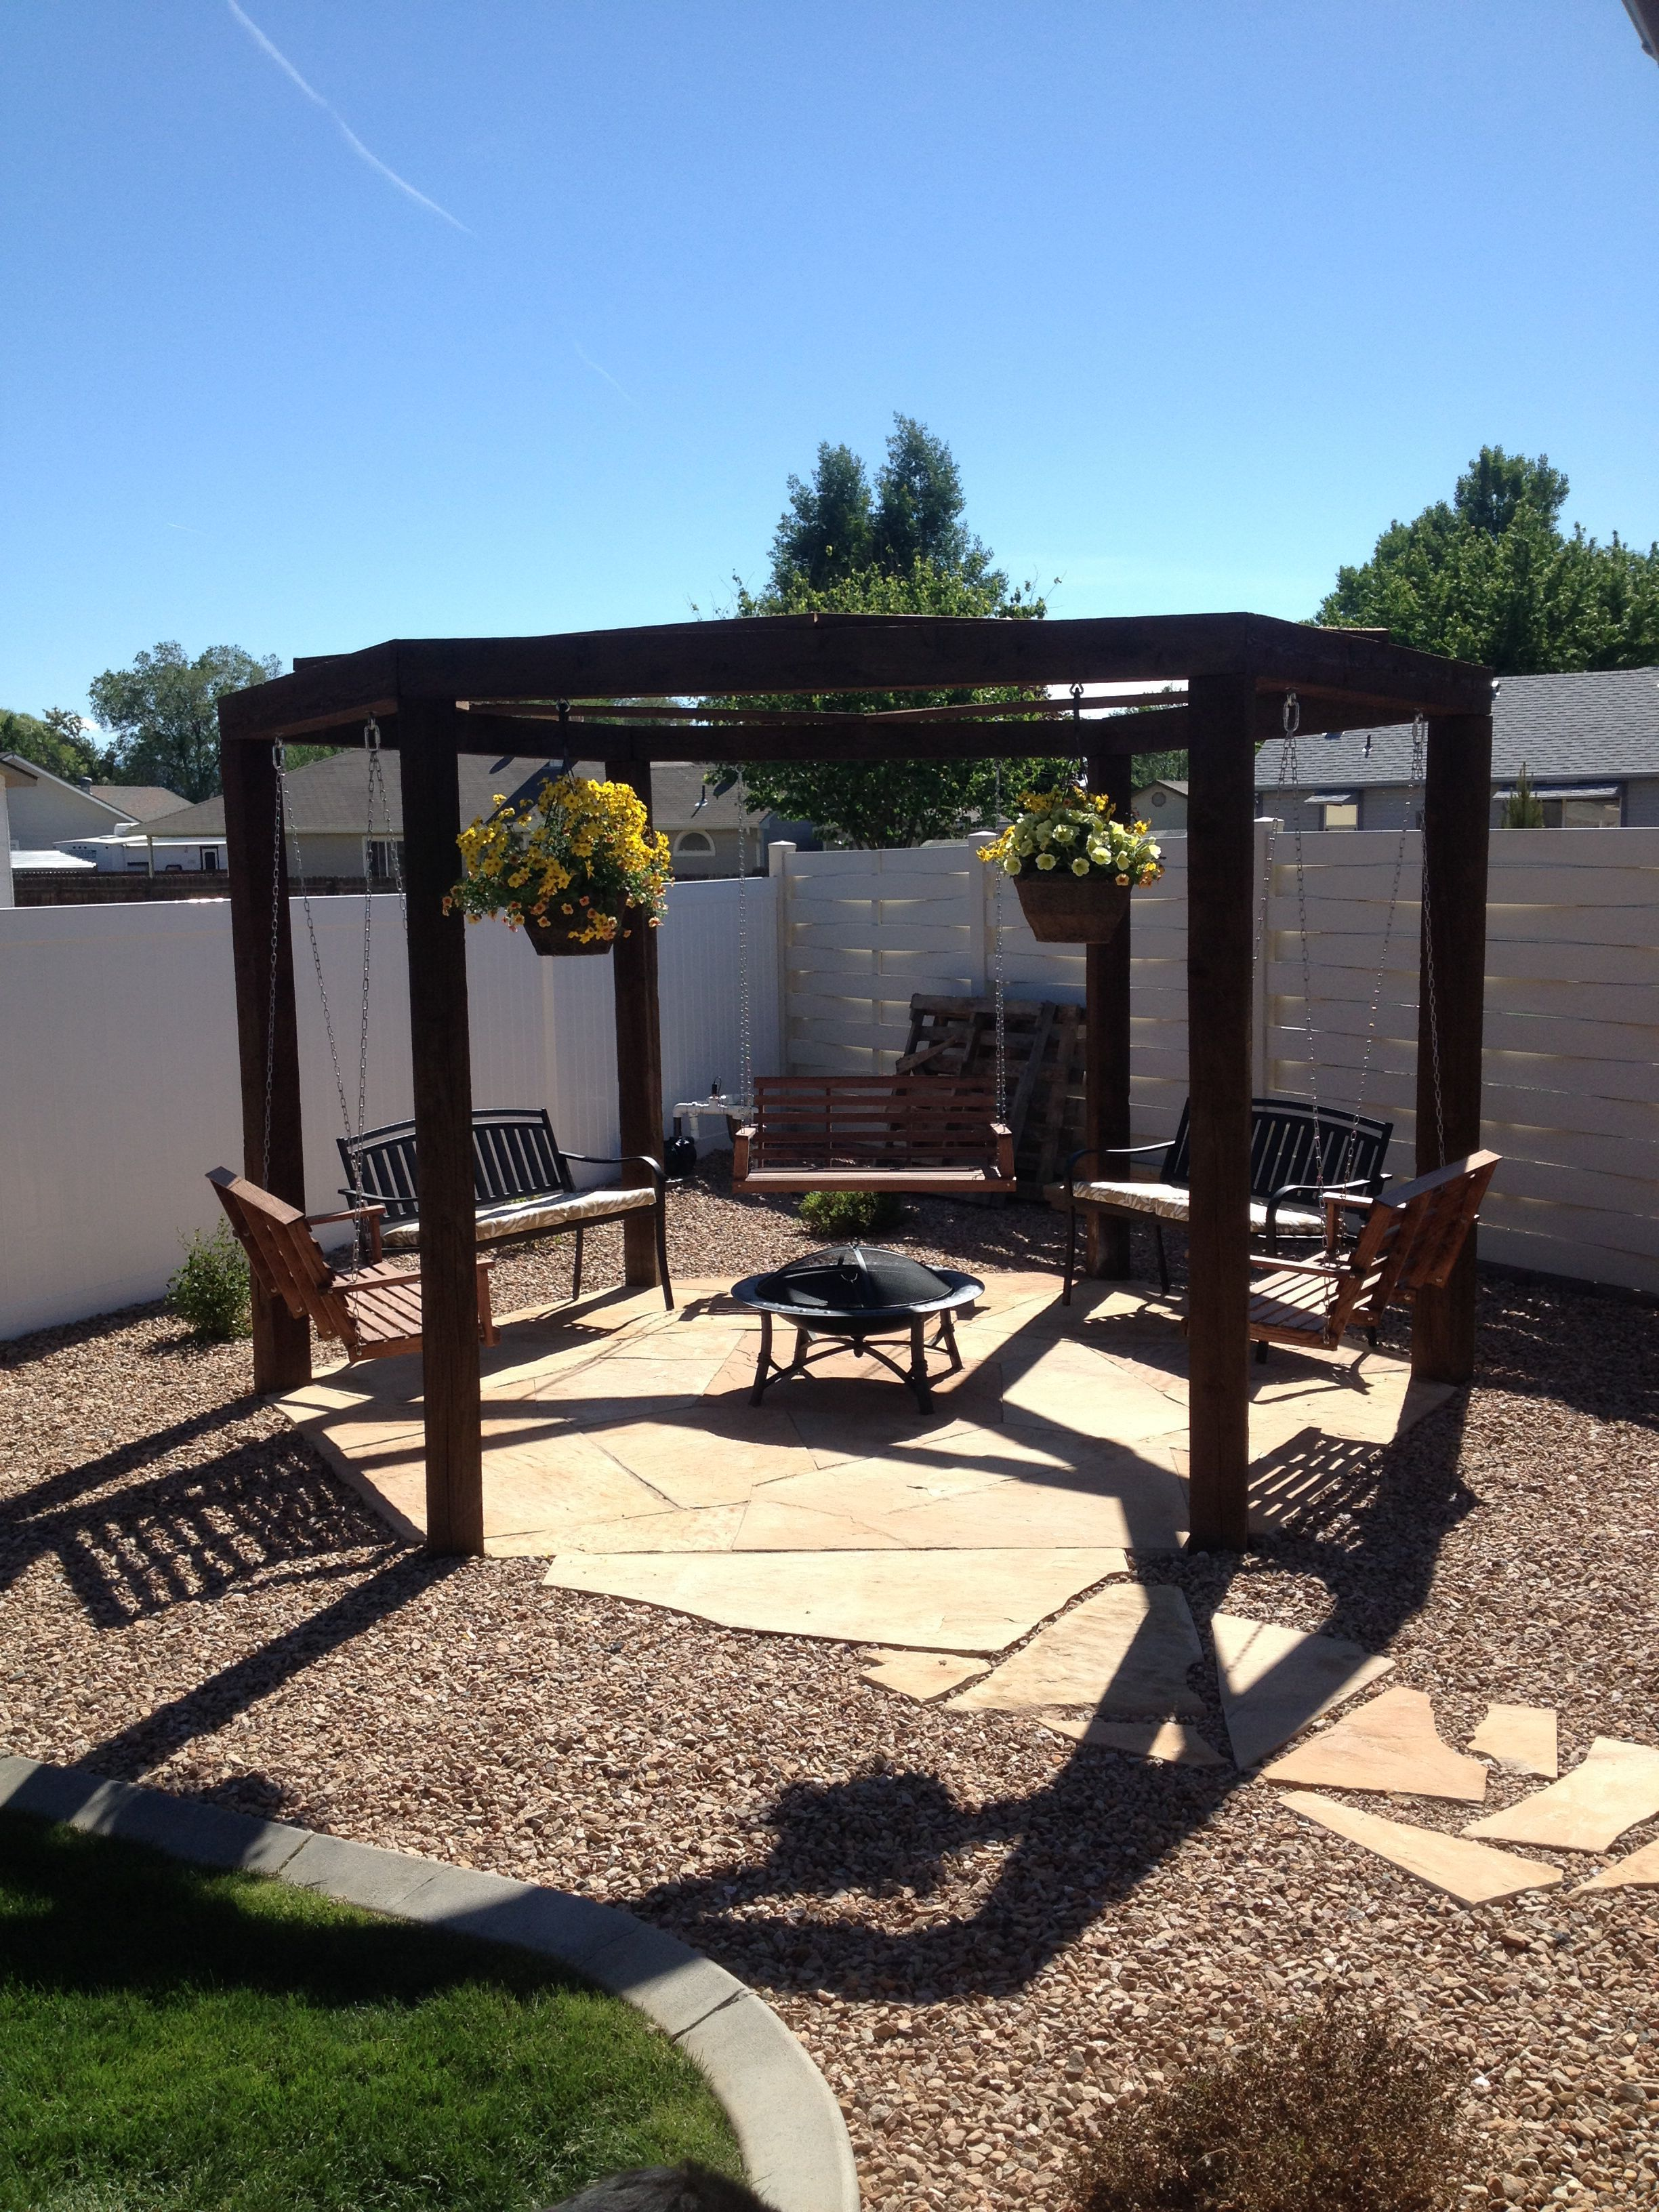 27 inspiring diy fire pit ideas to improve your backyard decor rh pinterest com